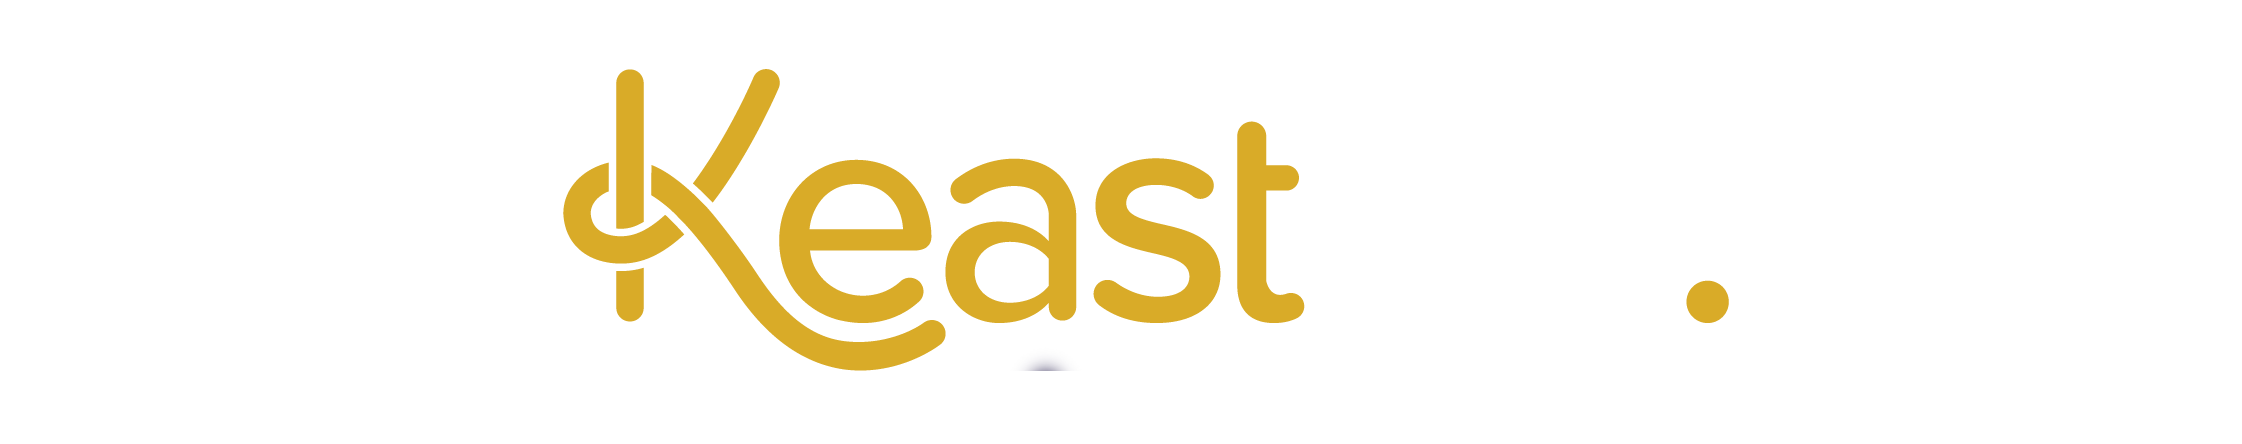 KeastCo-REV-padding.png